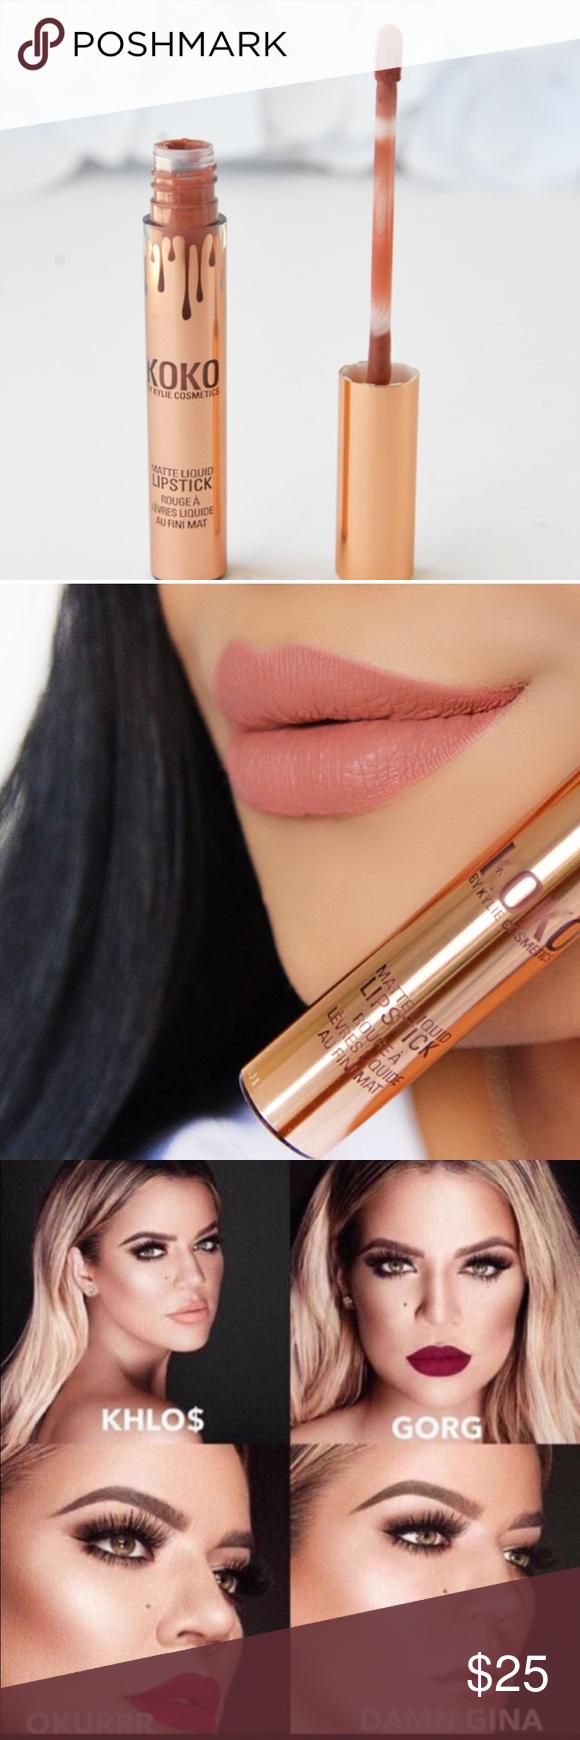 Kylie KOKO Kollection Matte Liquid Lip in KHLO$💋 | Kylie